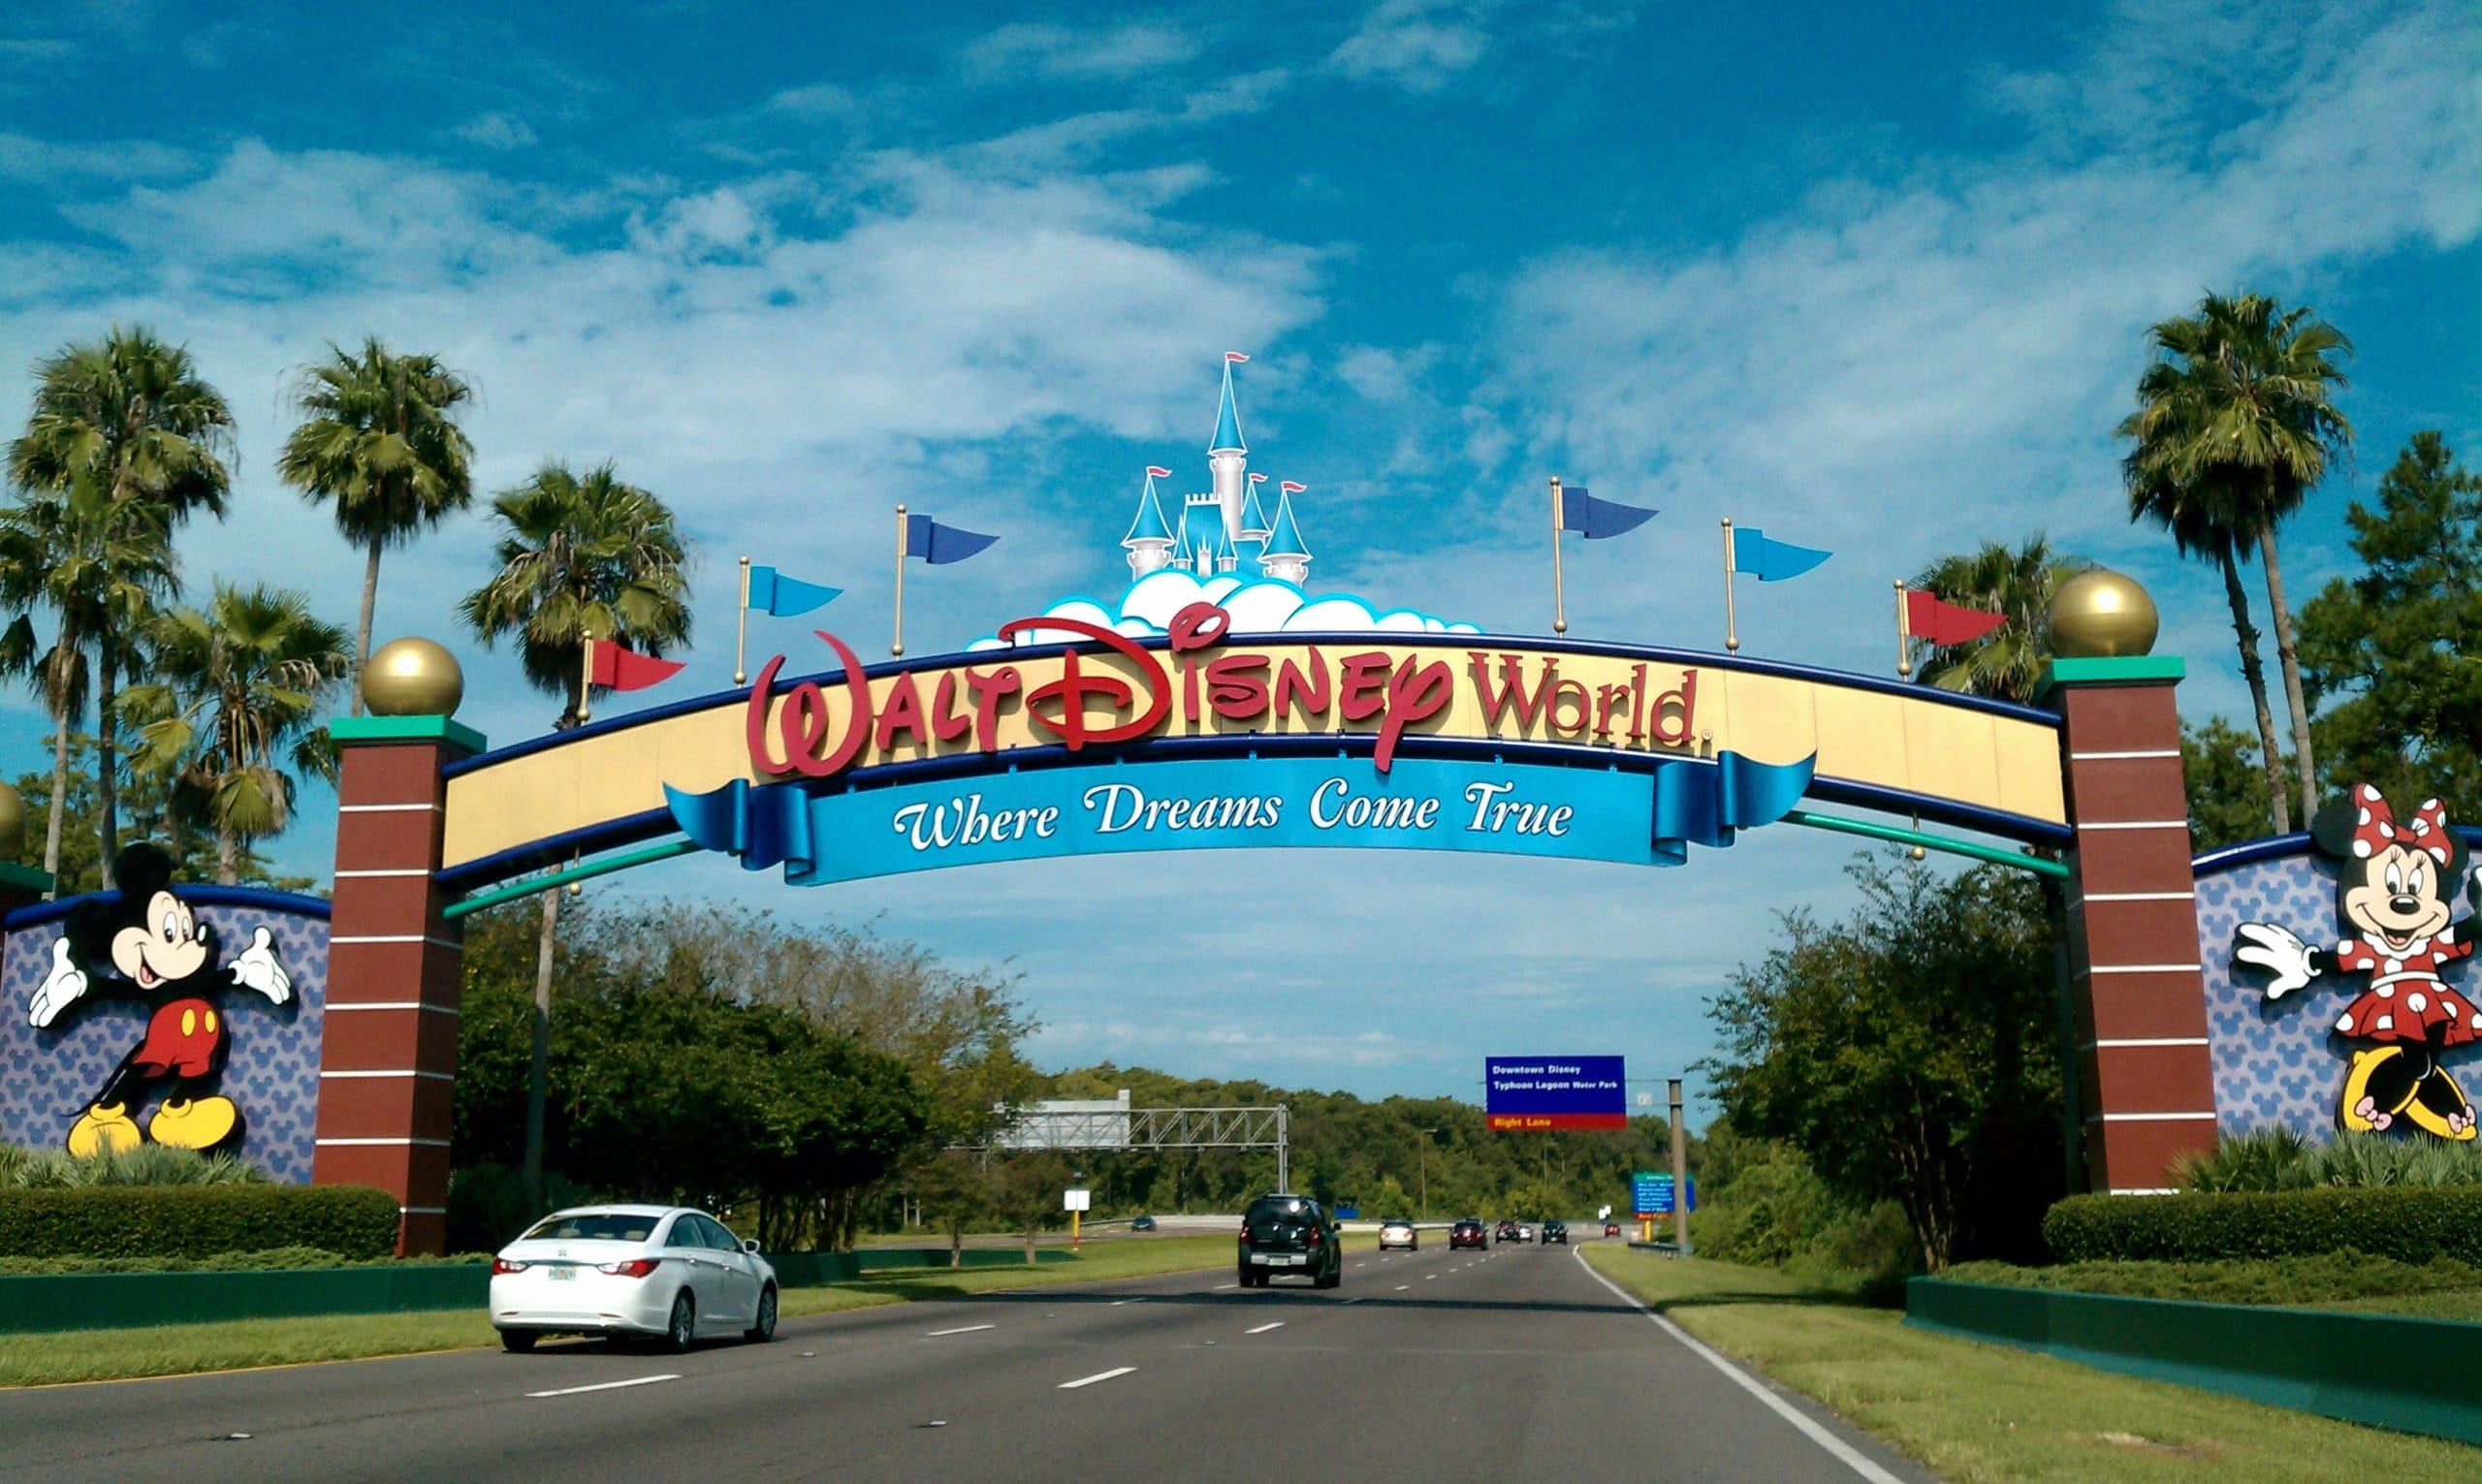 Entrance to Disney World